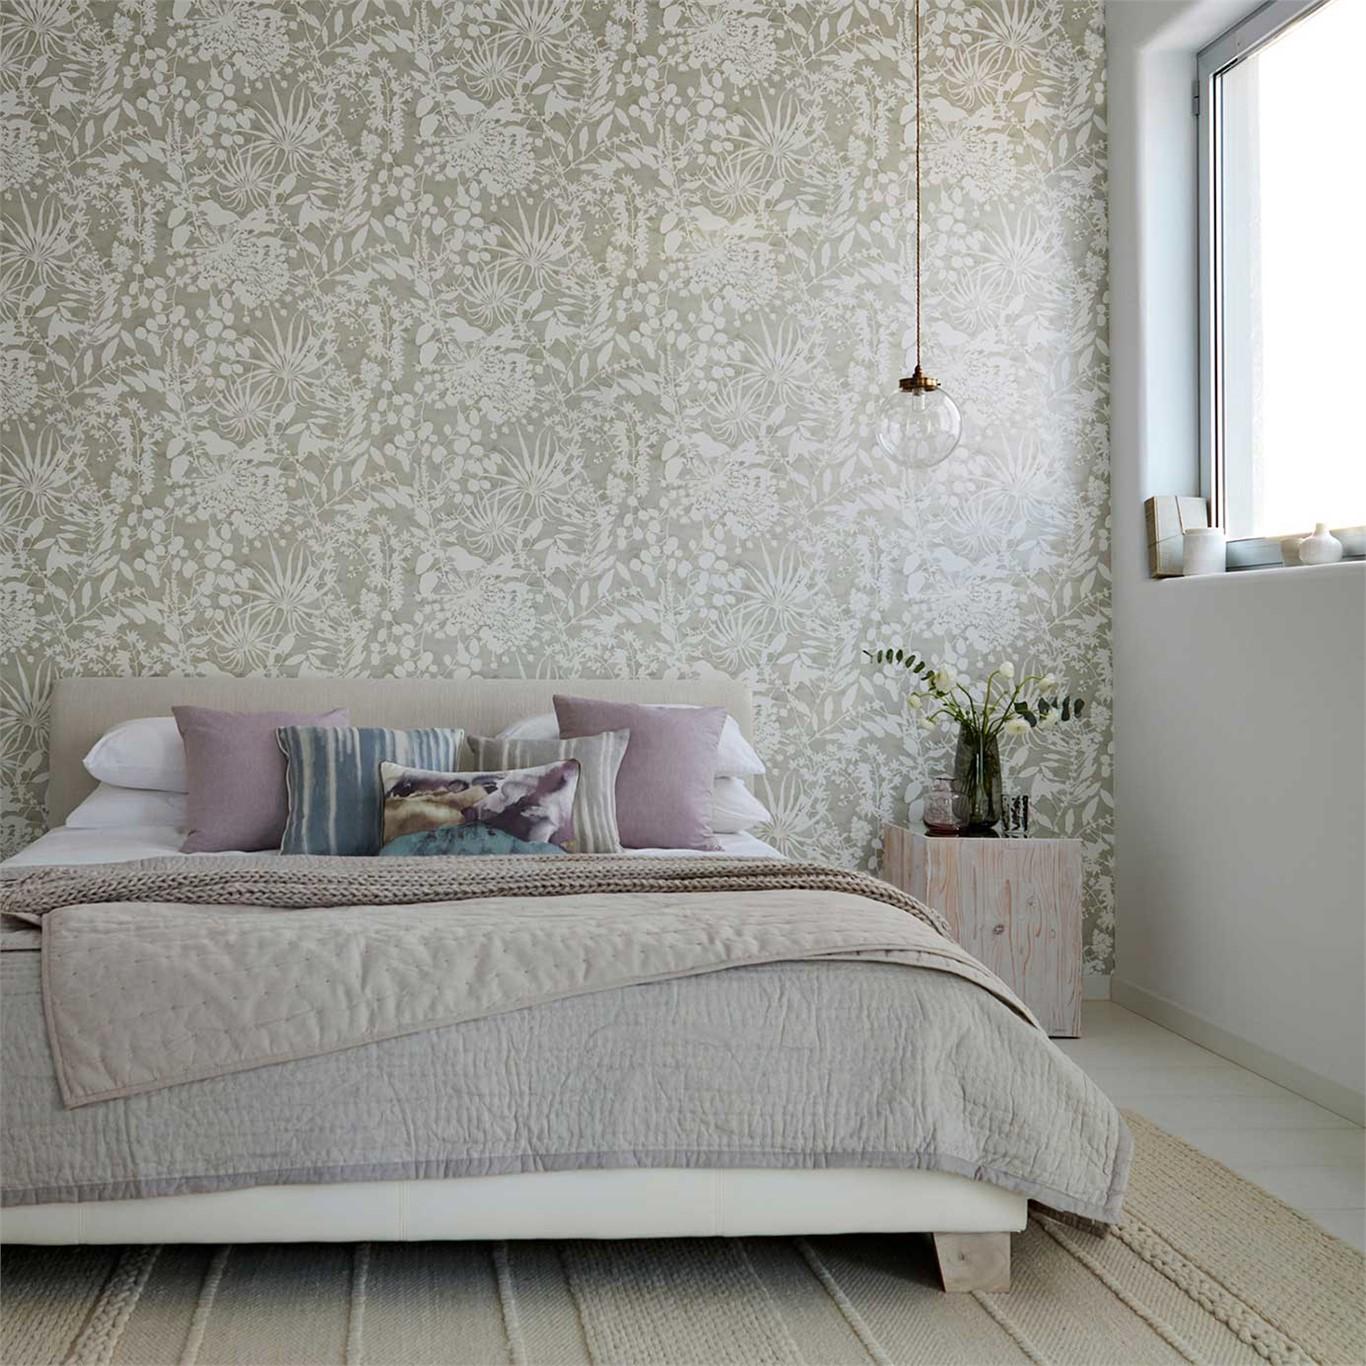 Dormitorios Decorados Con Papel Pintado Affordable Pared De